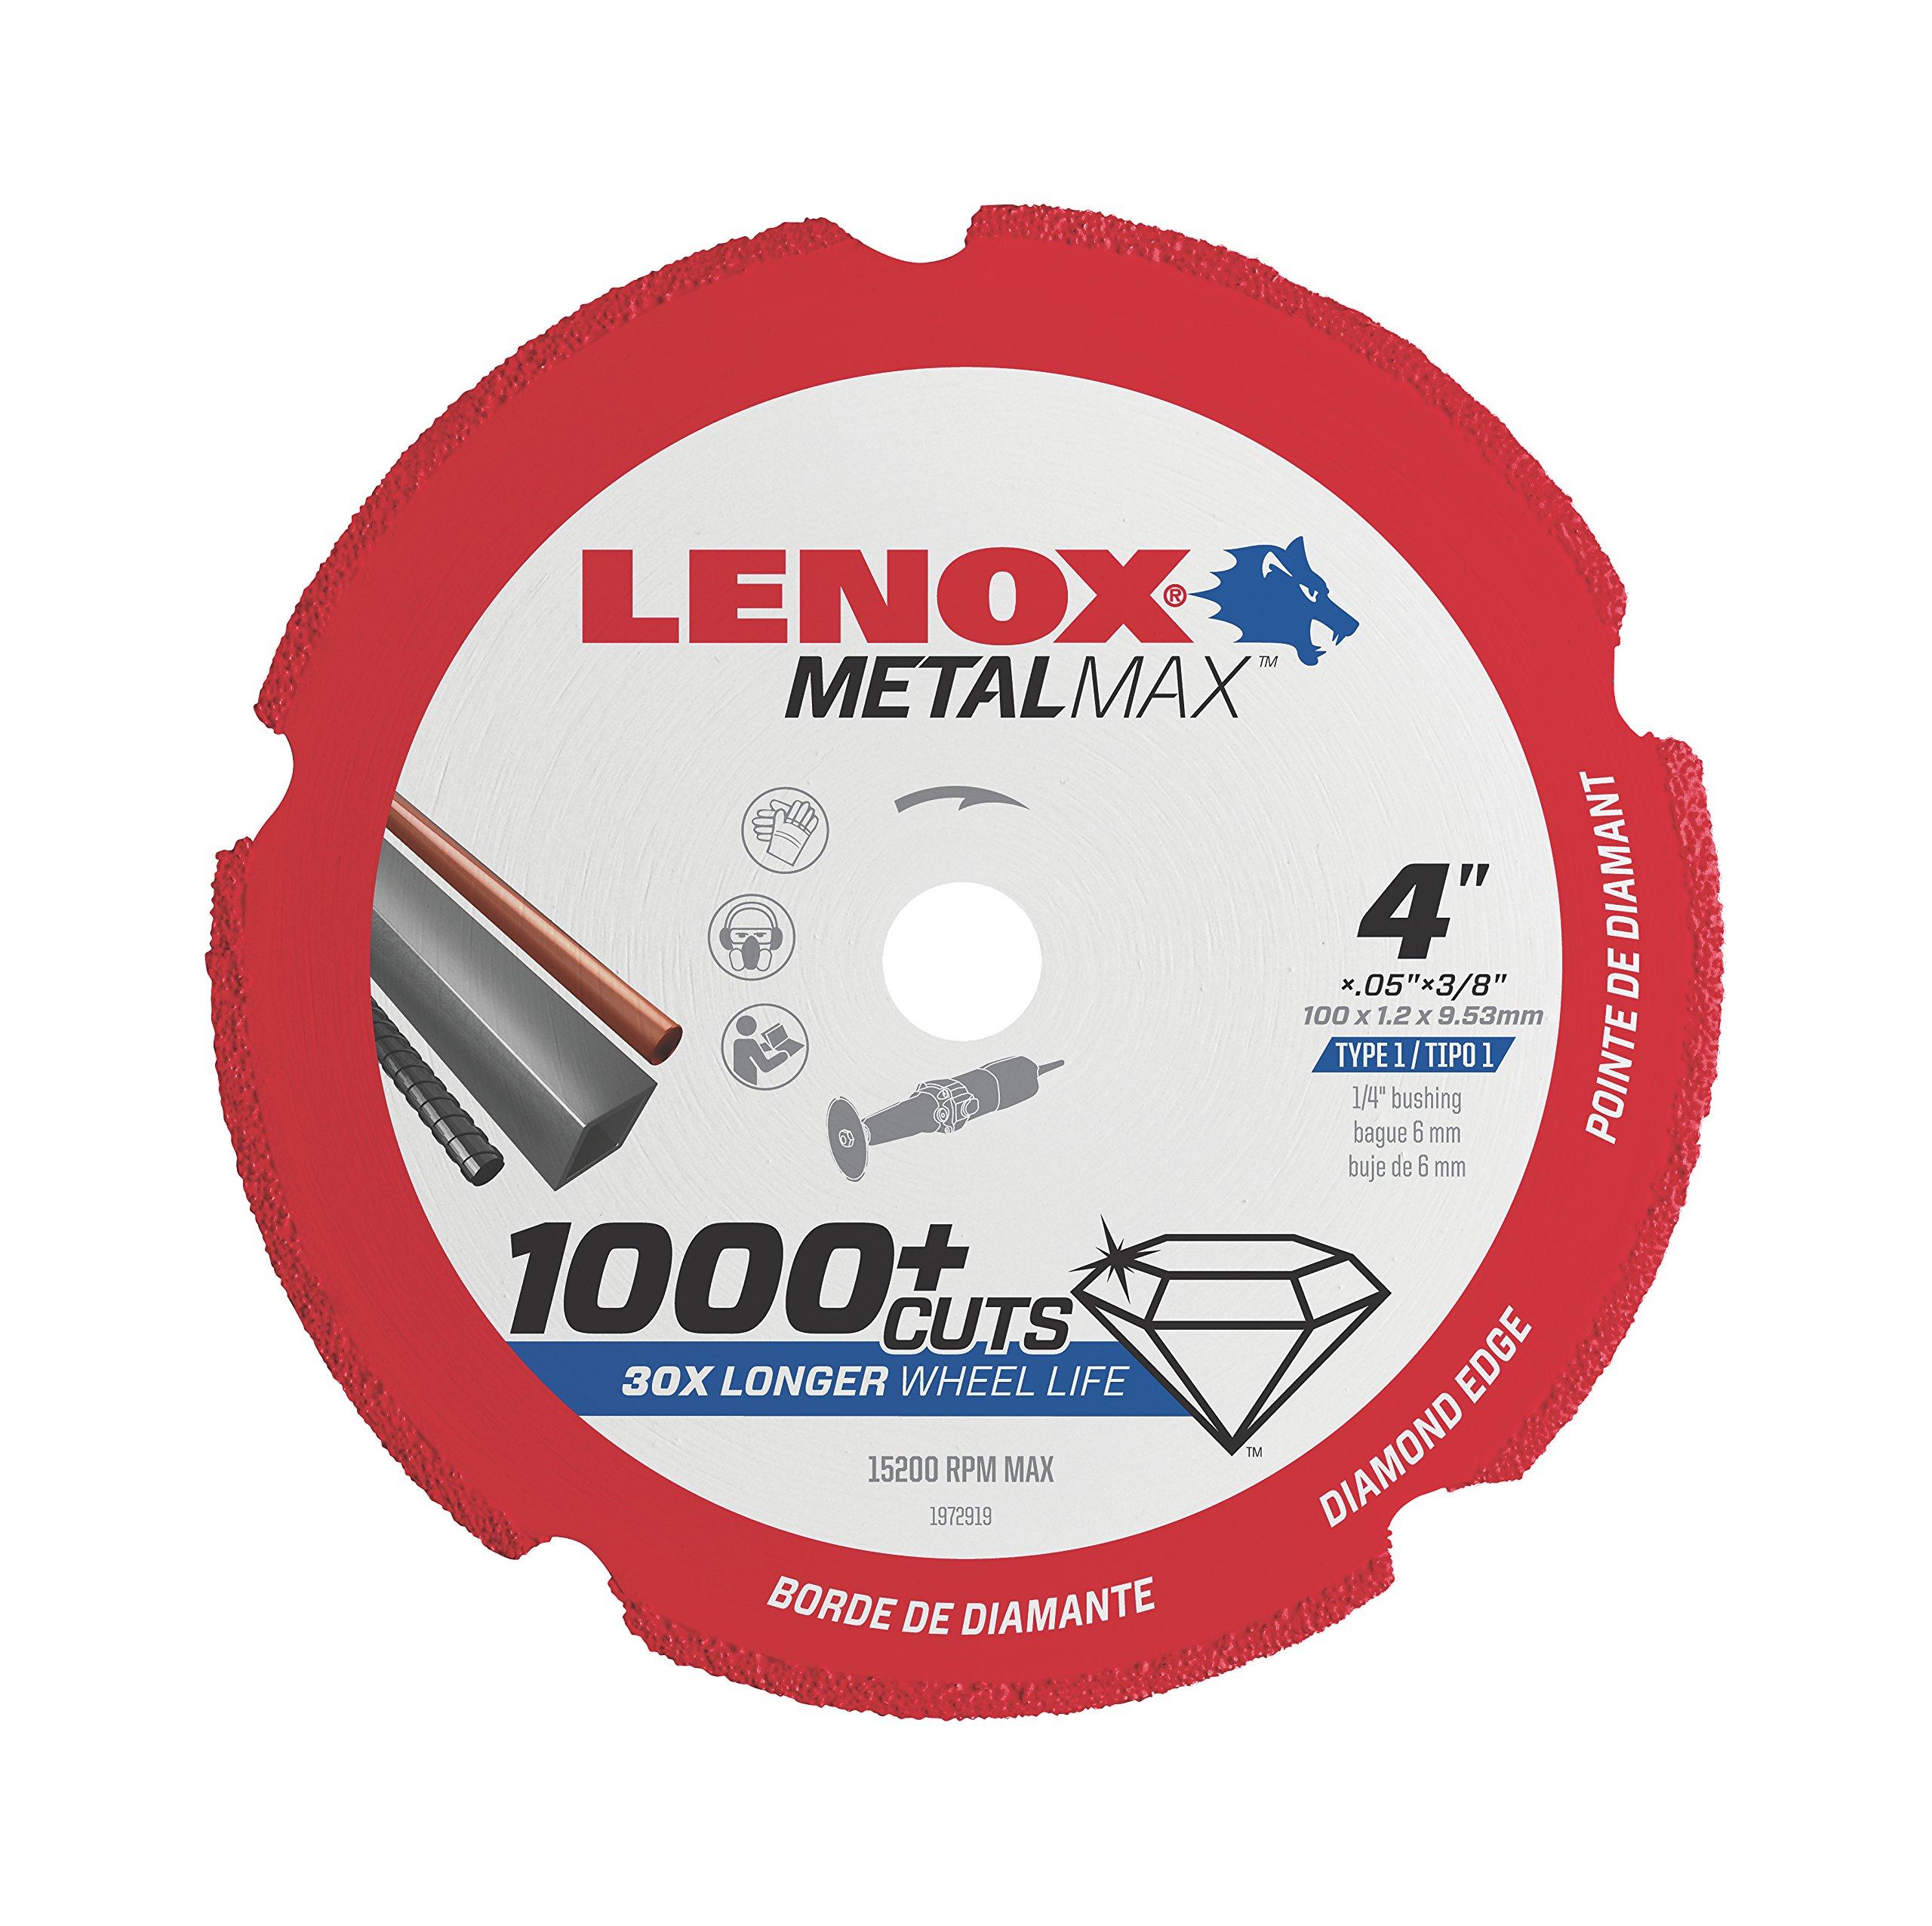 Lenox Tools 1972919 METALMAX Diamond Edge Cutoff Wheel, 4'' x 3/8''